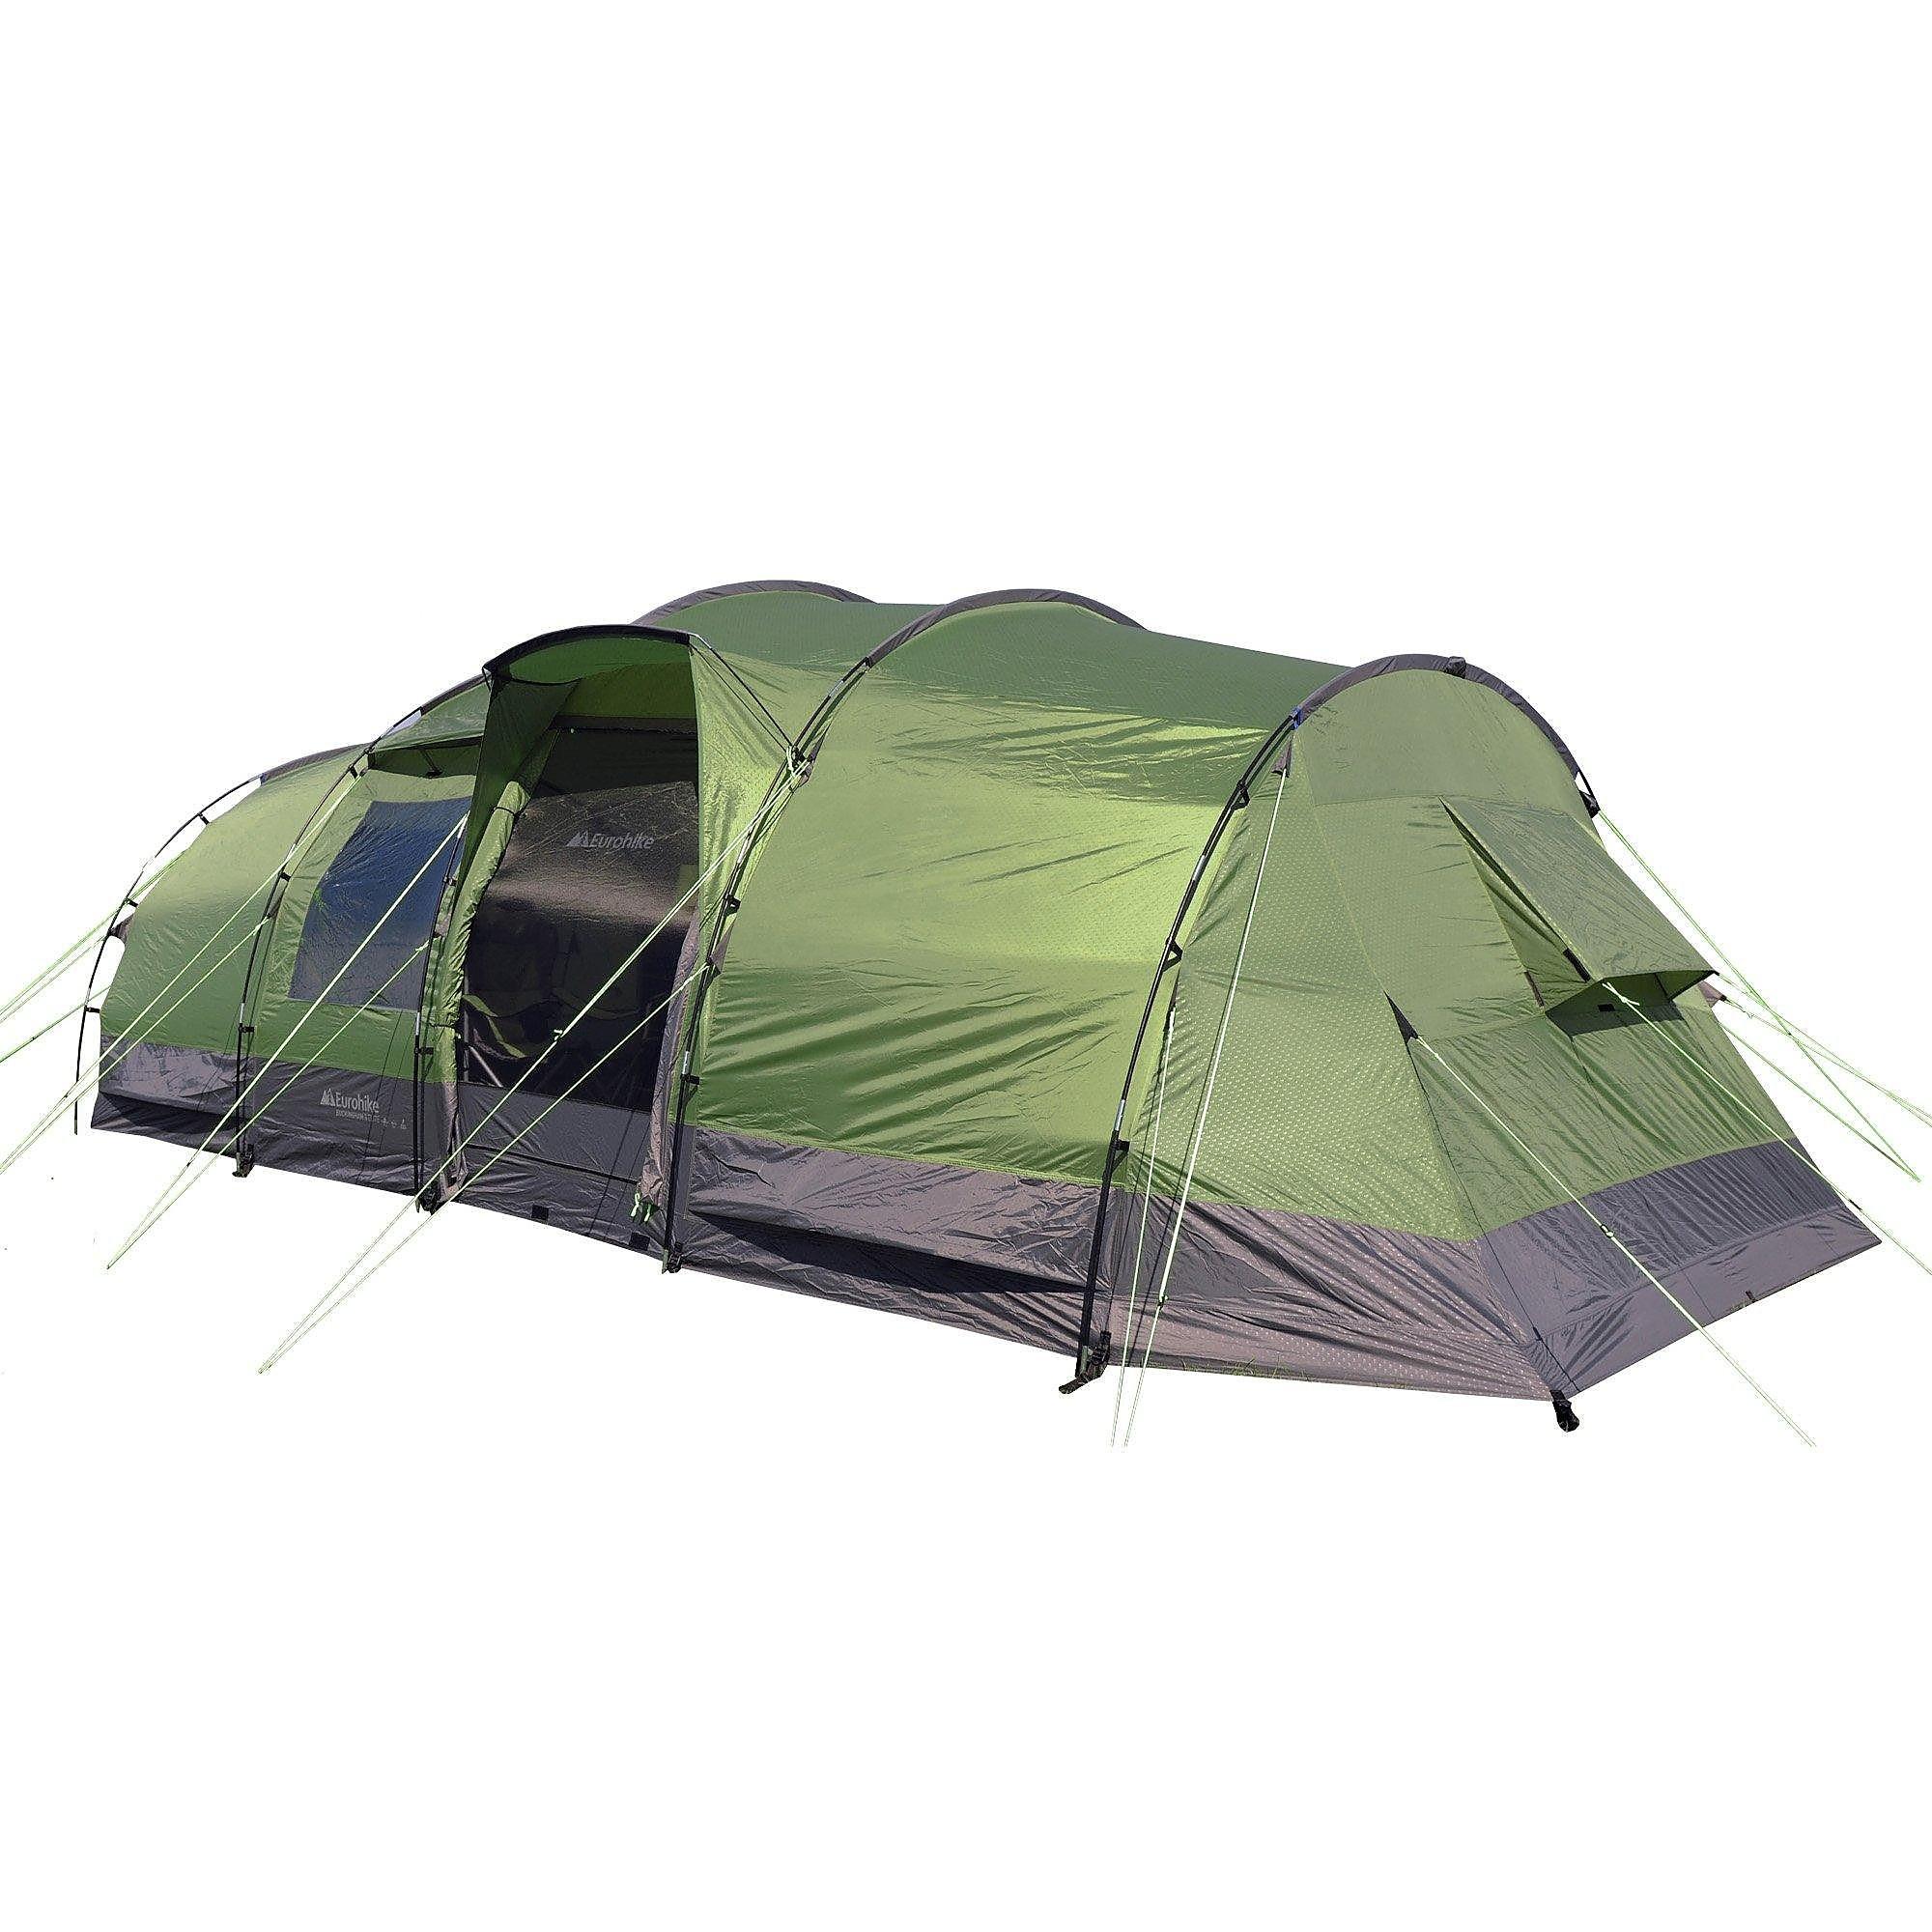 EUROHIKE Buckingham Elite 8 Man Tent